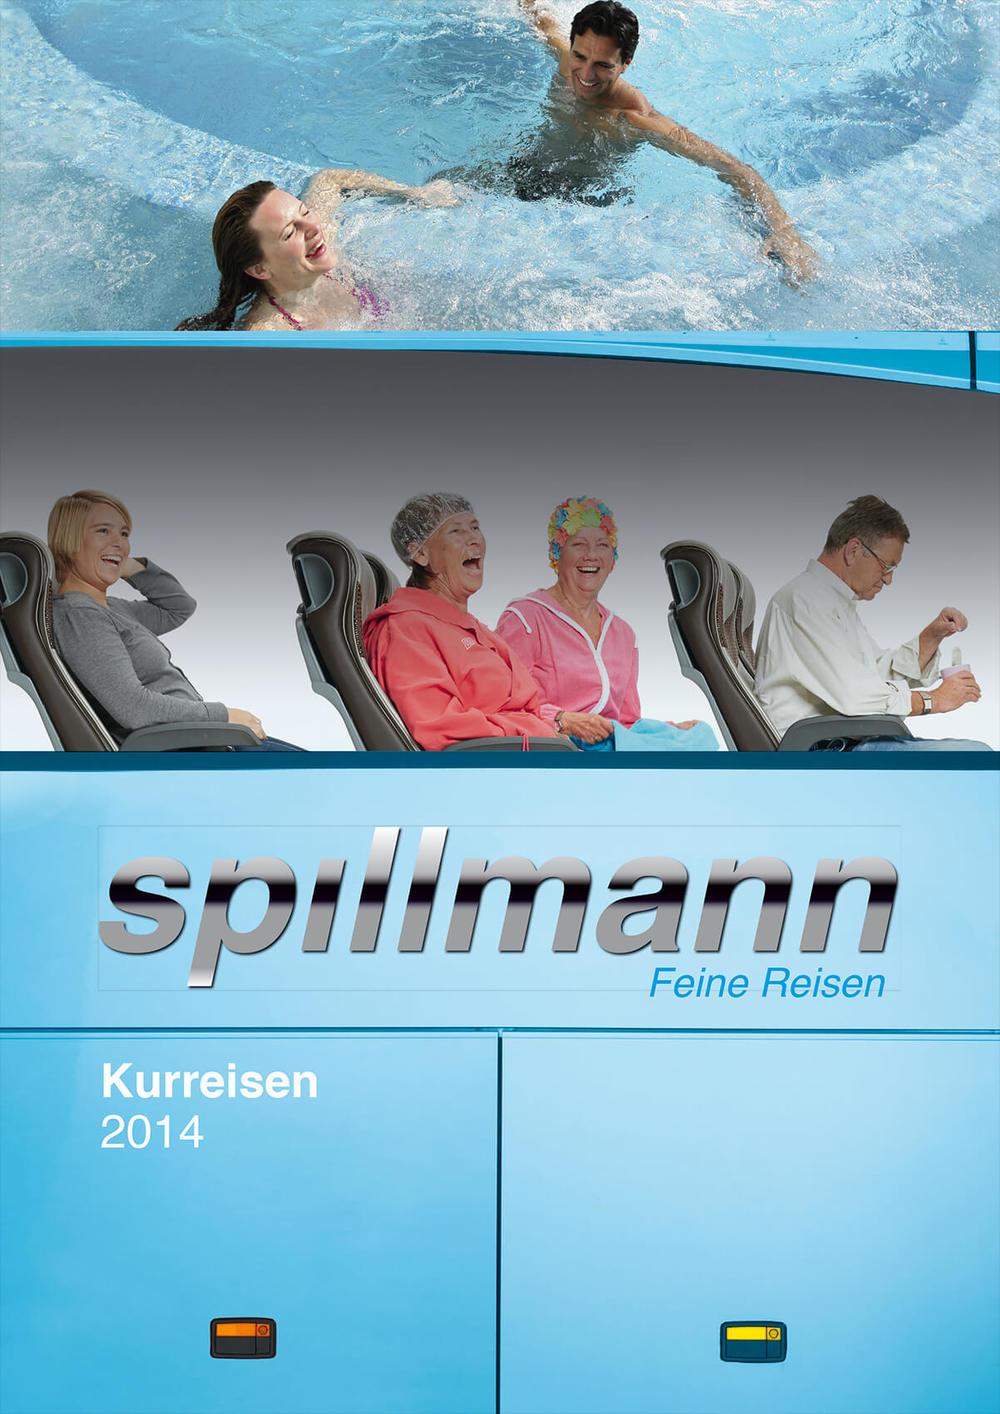 kur-reisekatalog-spillmann-agentur-intermar-corporate.jpg